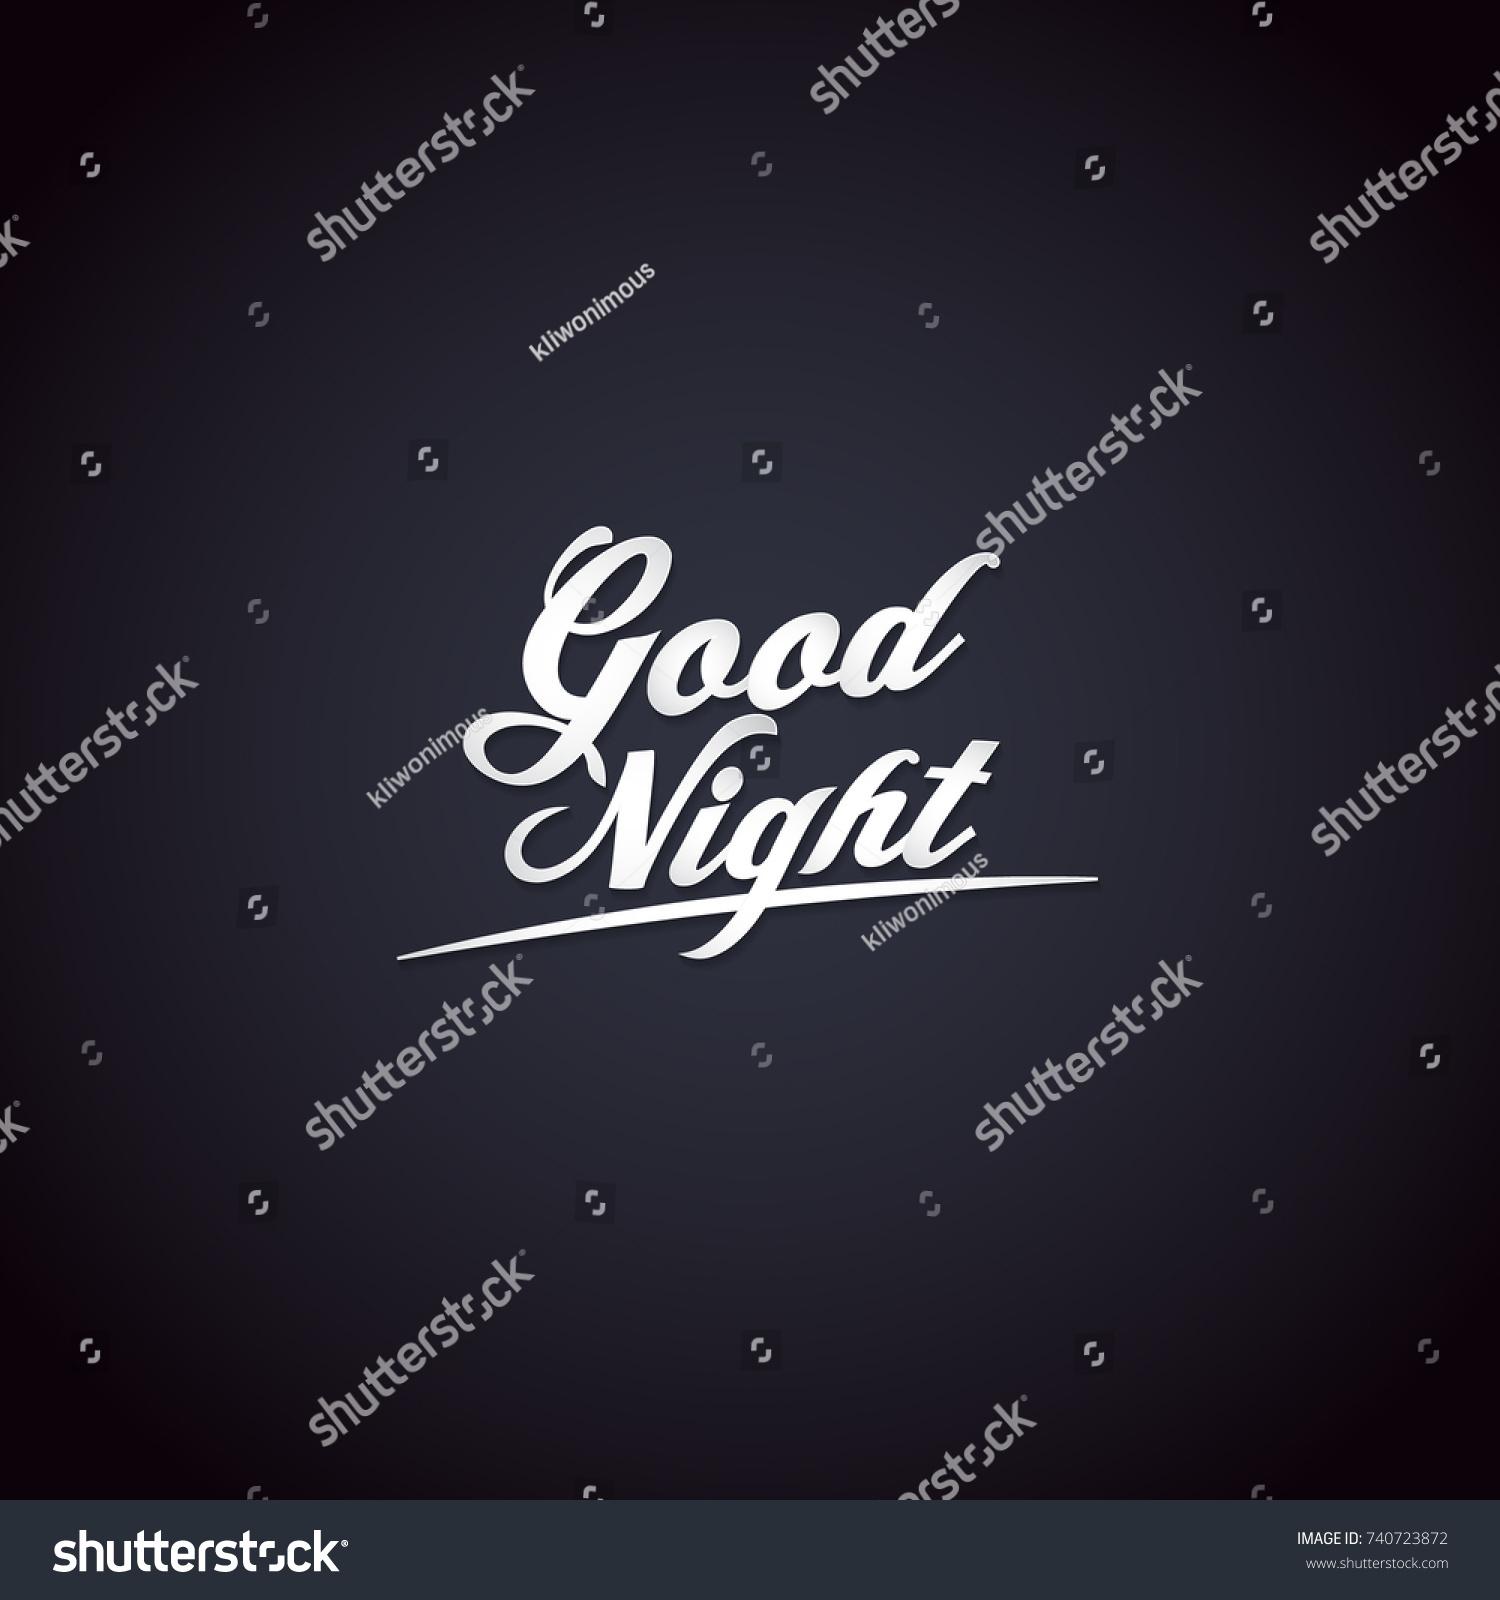 Good Night Greeting Card Vector Illustration Stock Vector Royalty